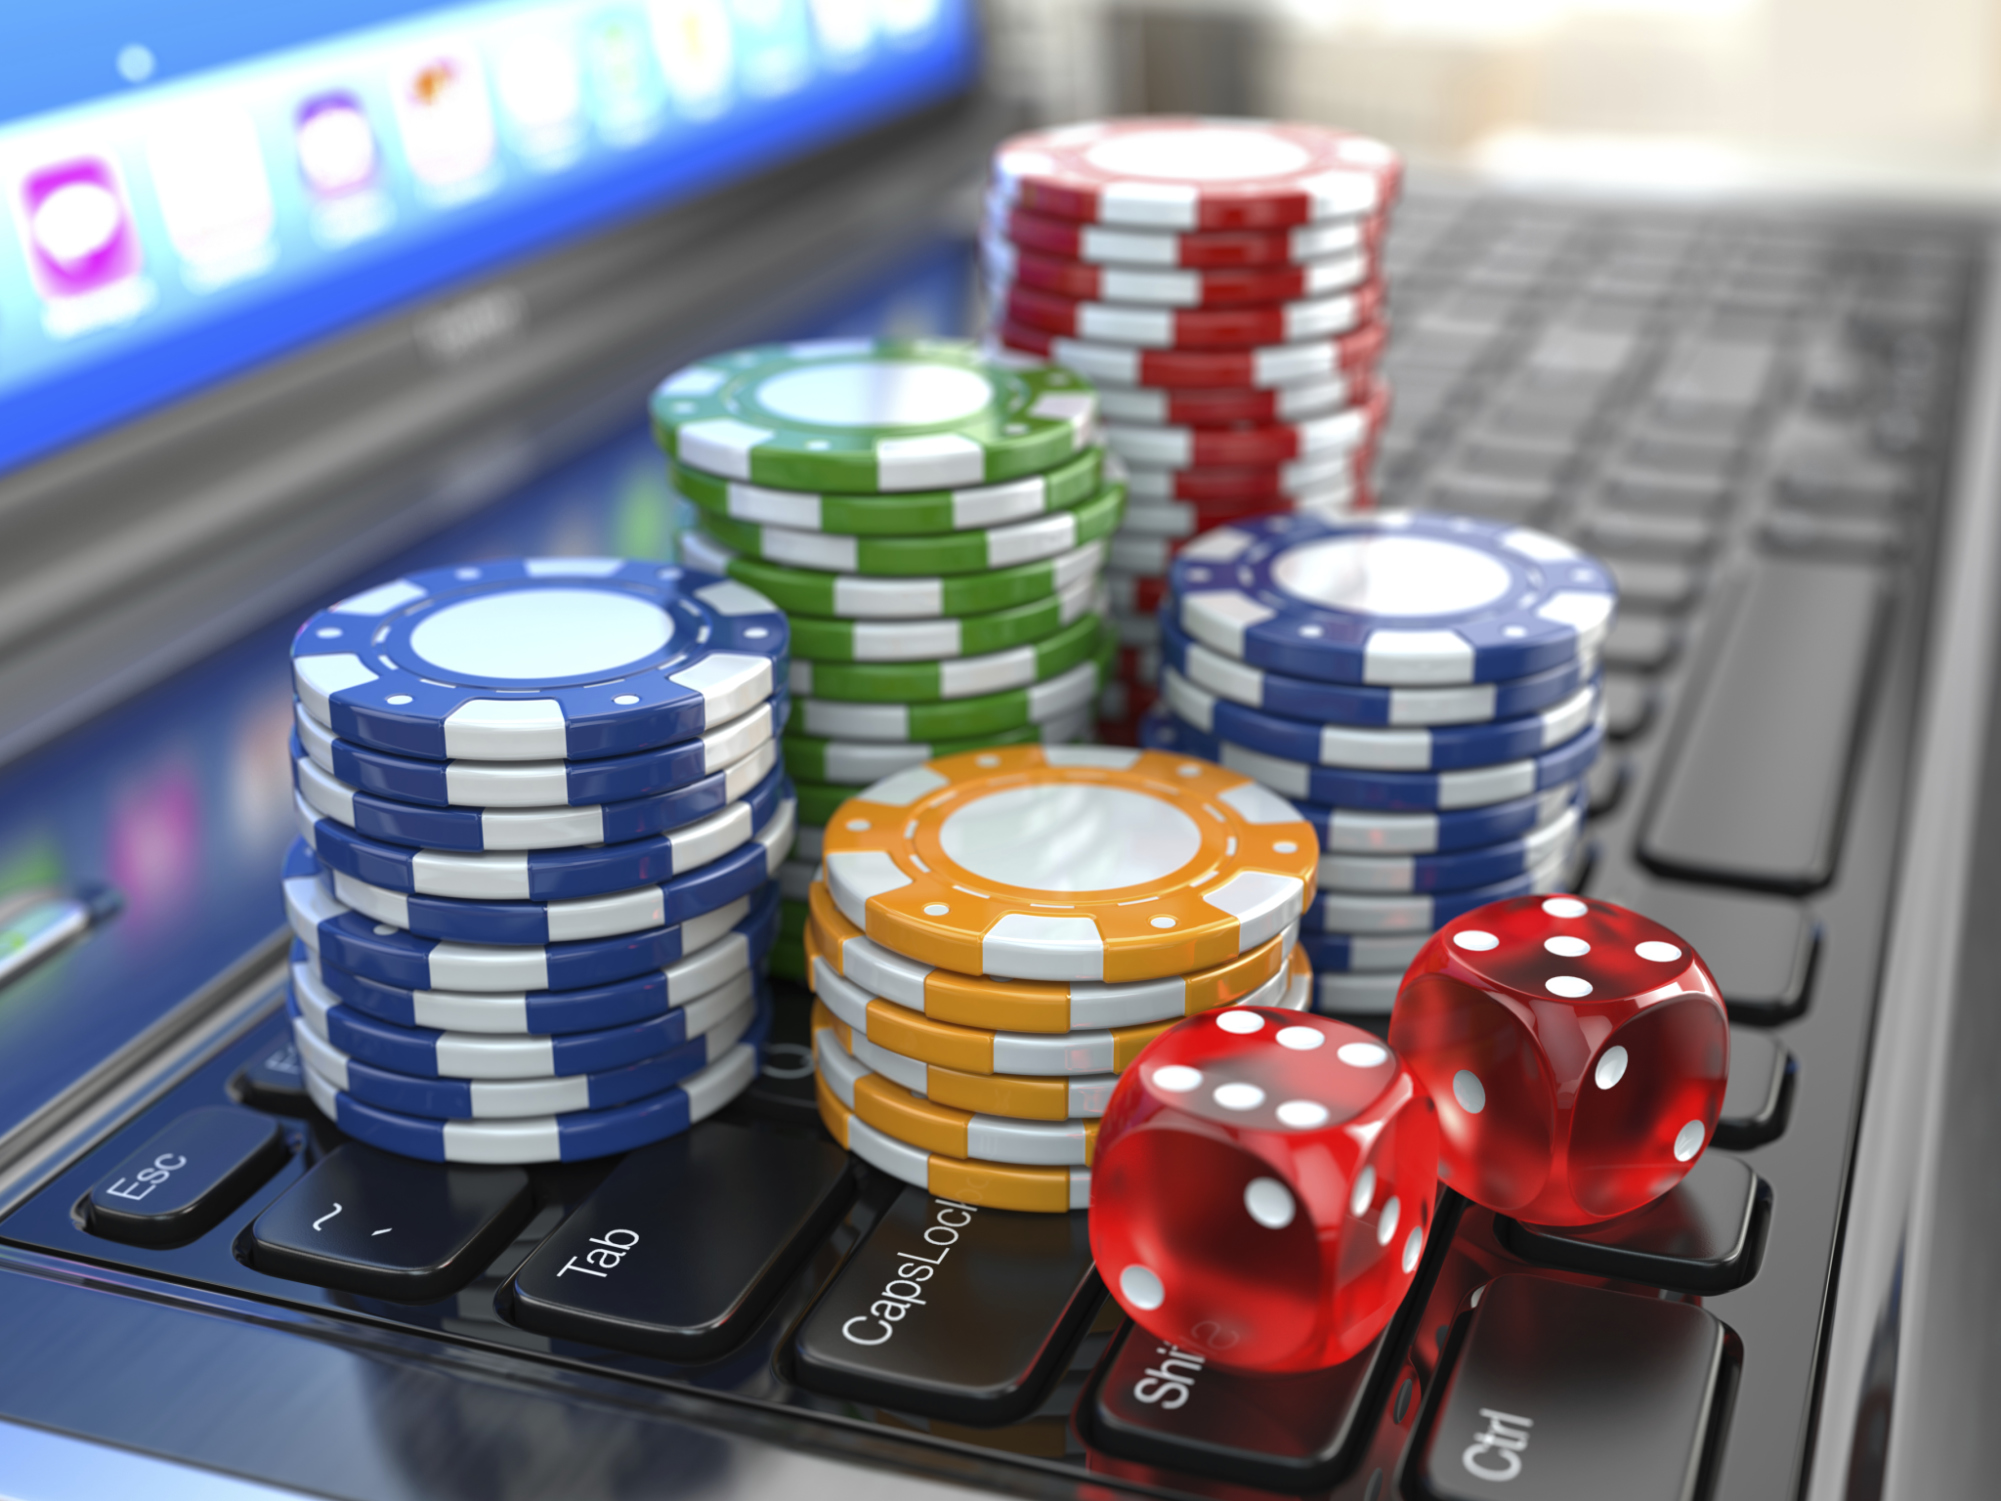 Web Based Casino Online - Sports India Show